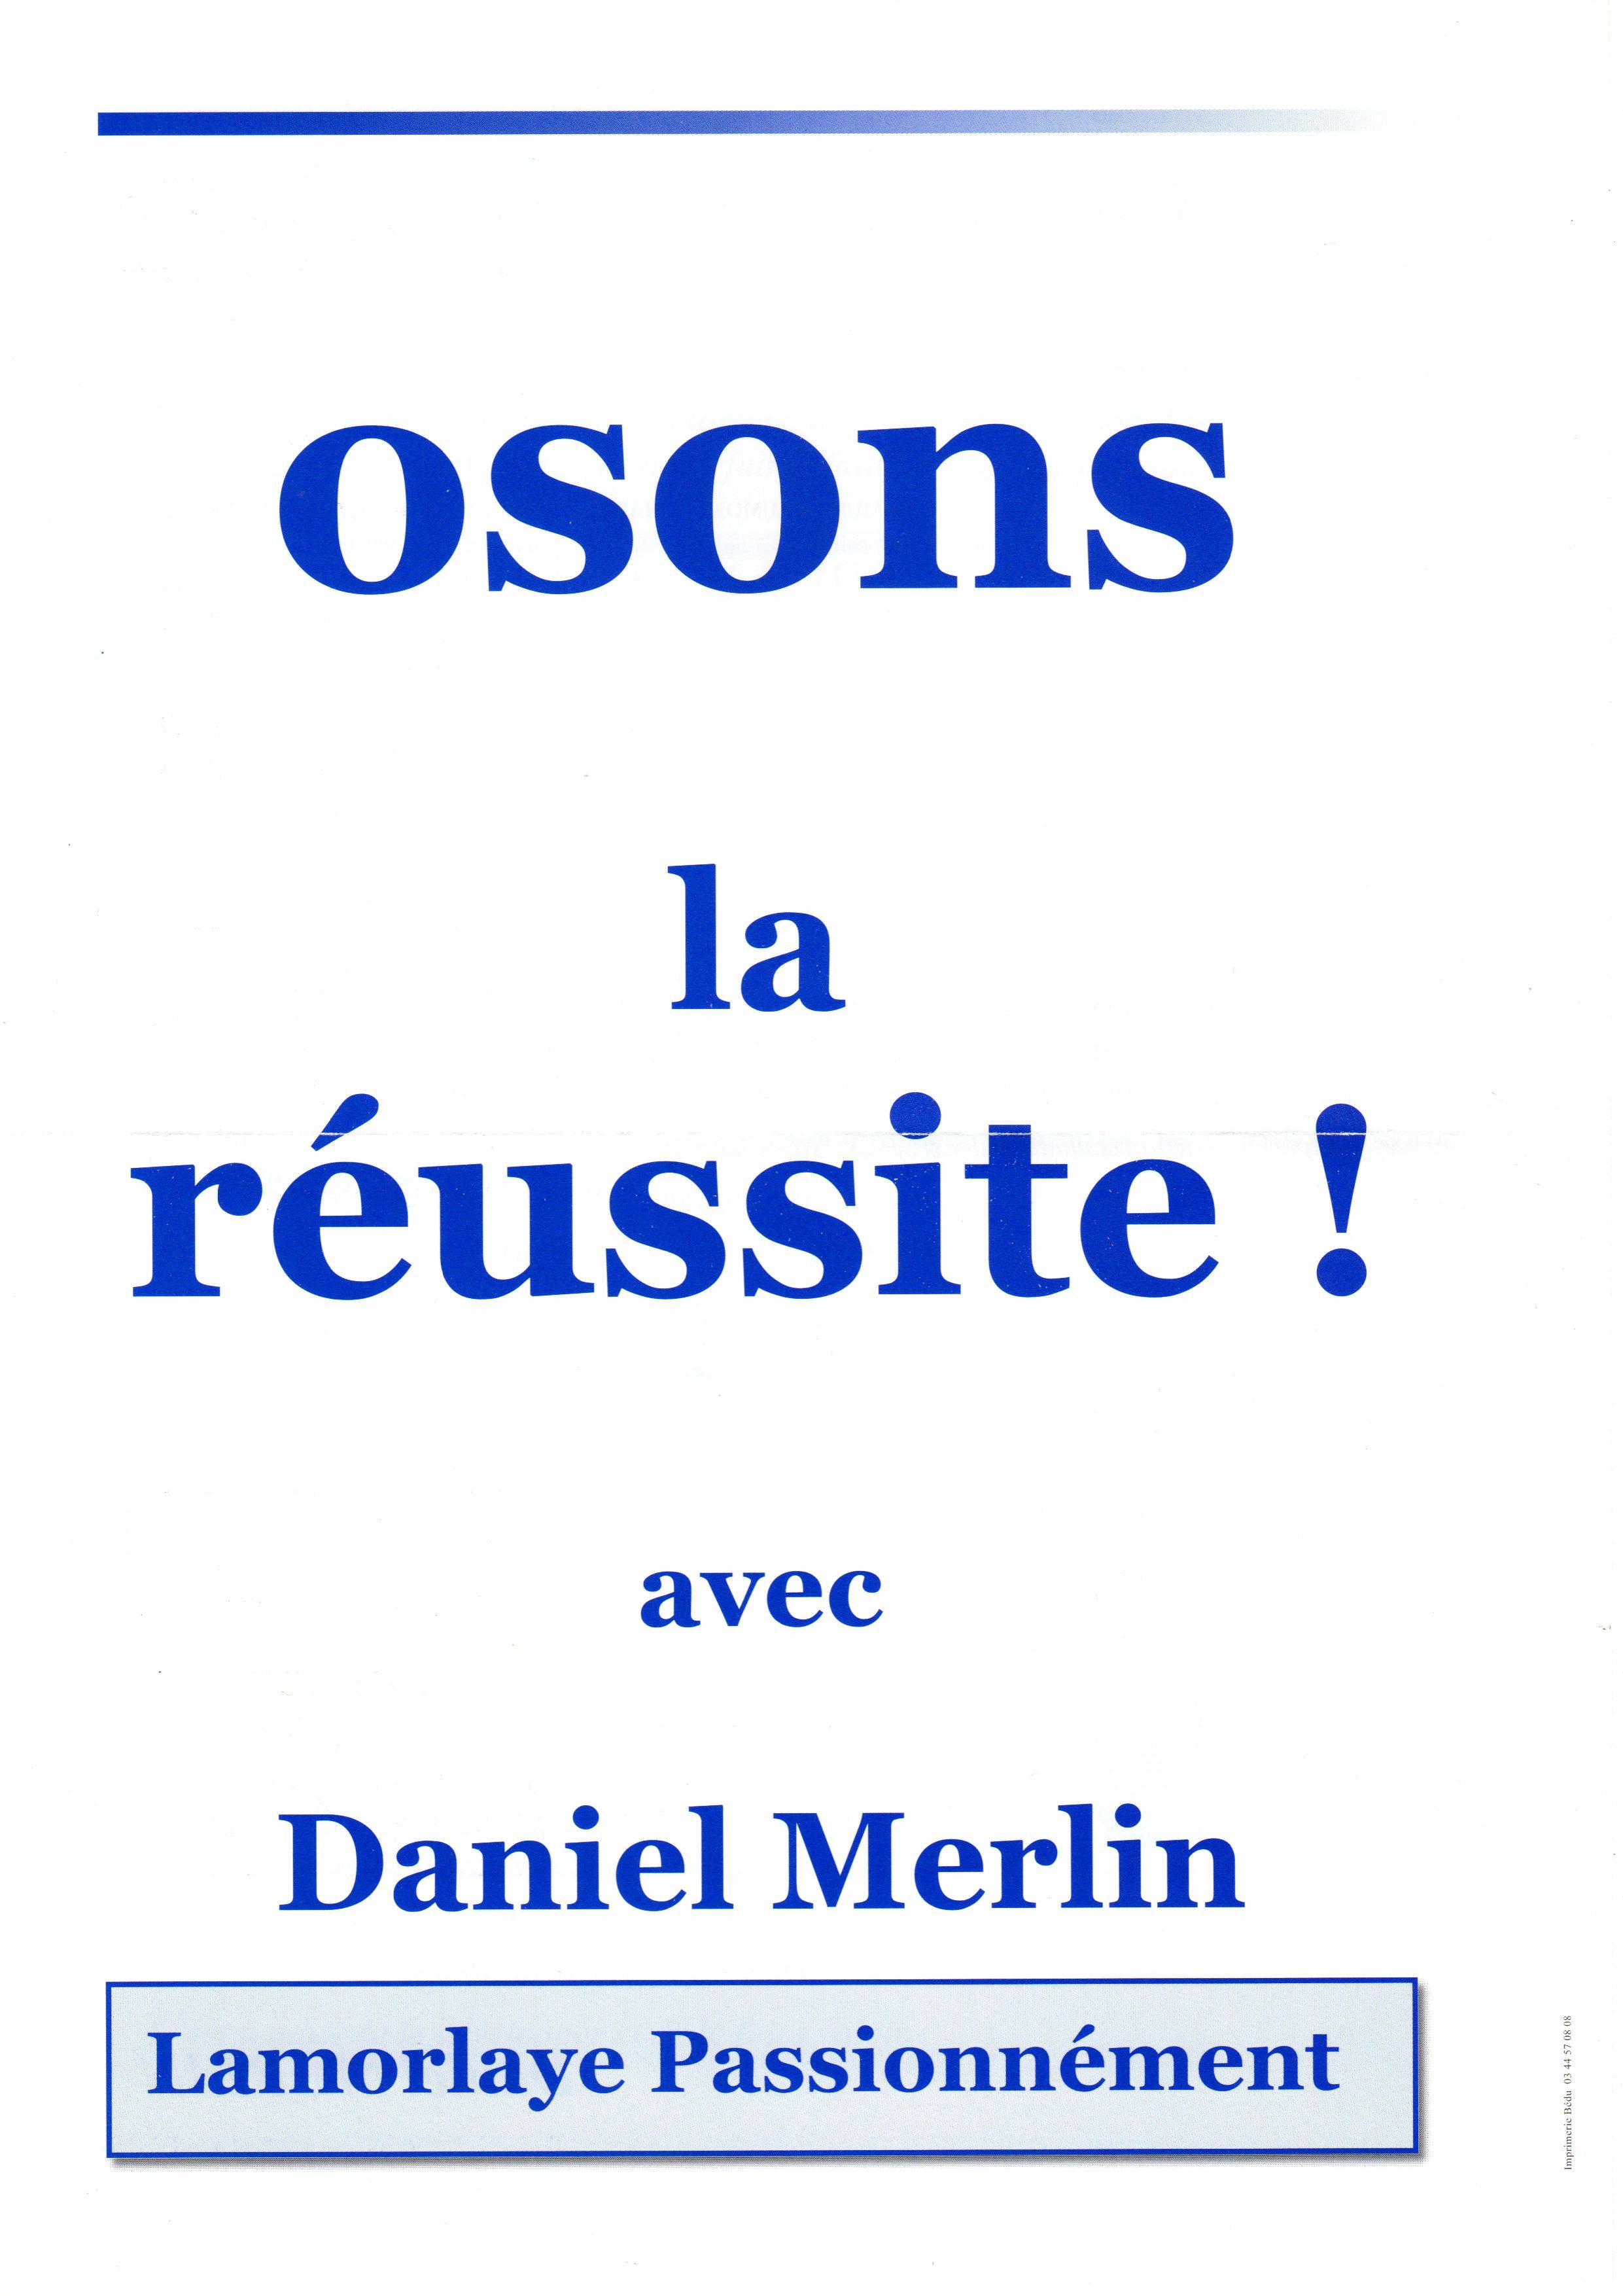 Daniel Merlin - Lettre ouverte 201805 p4